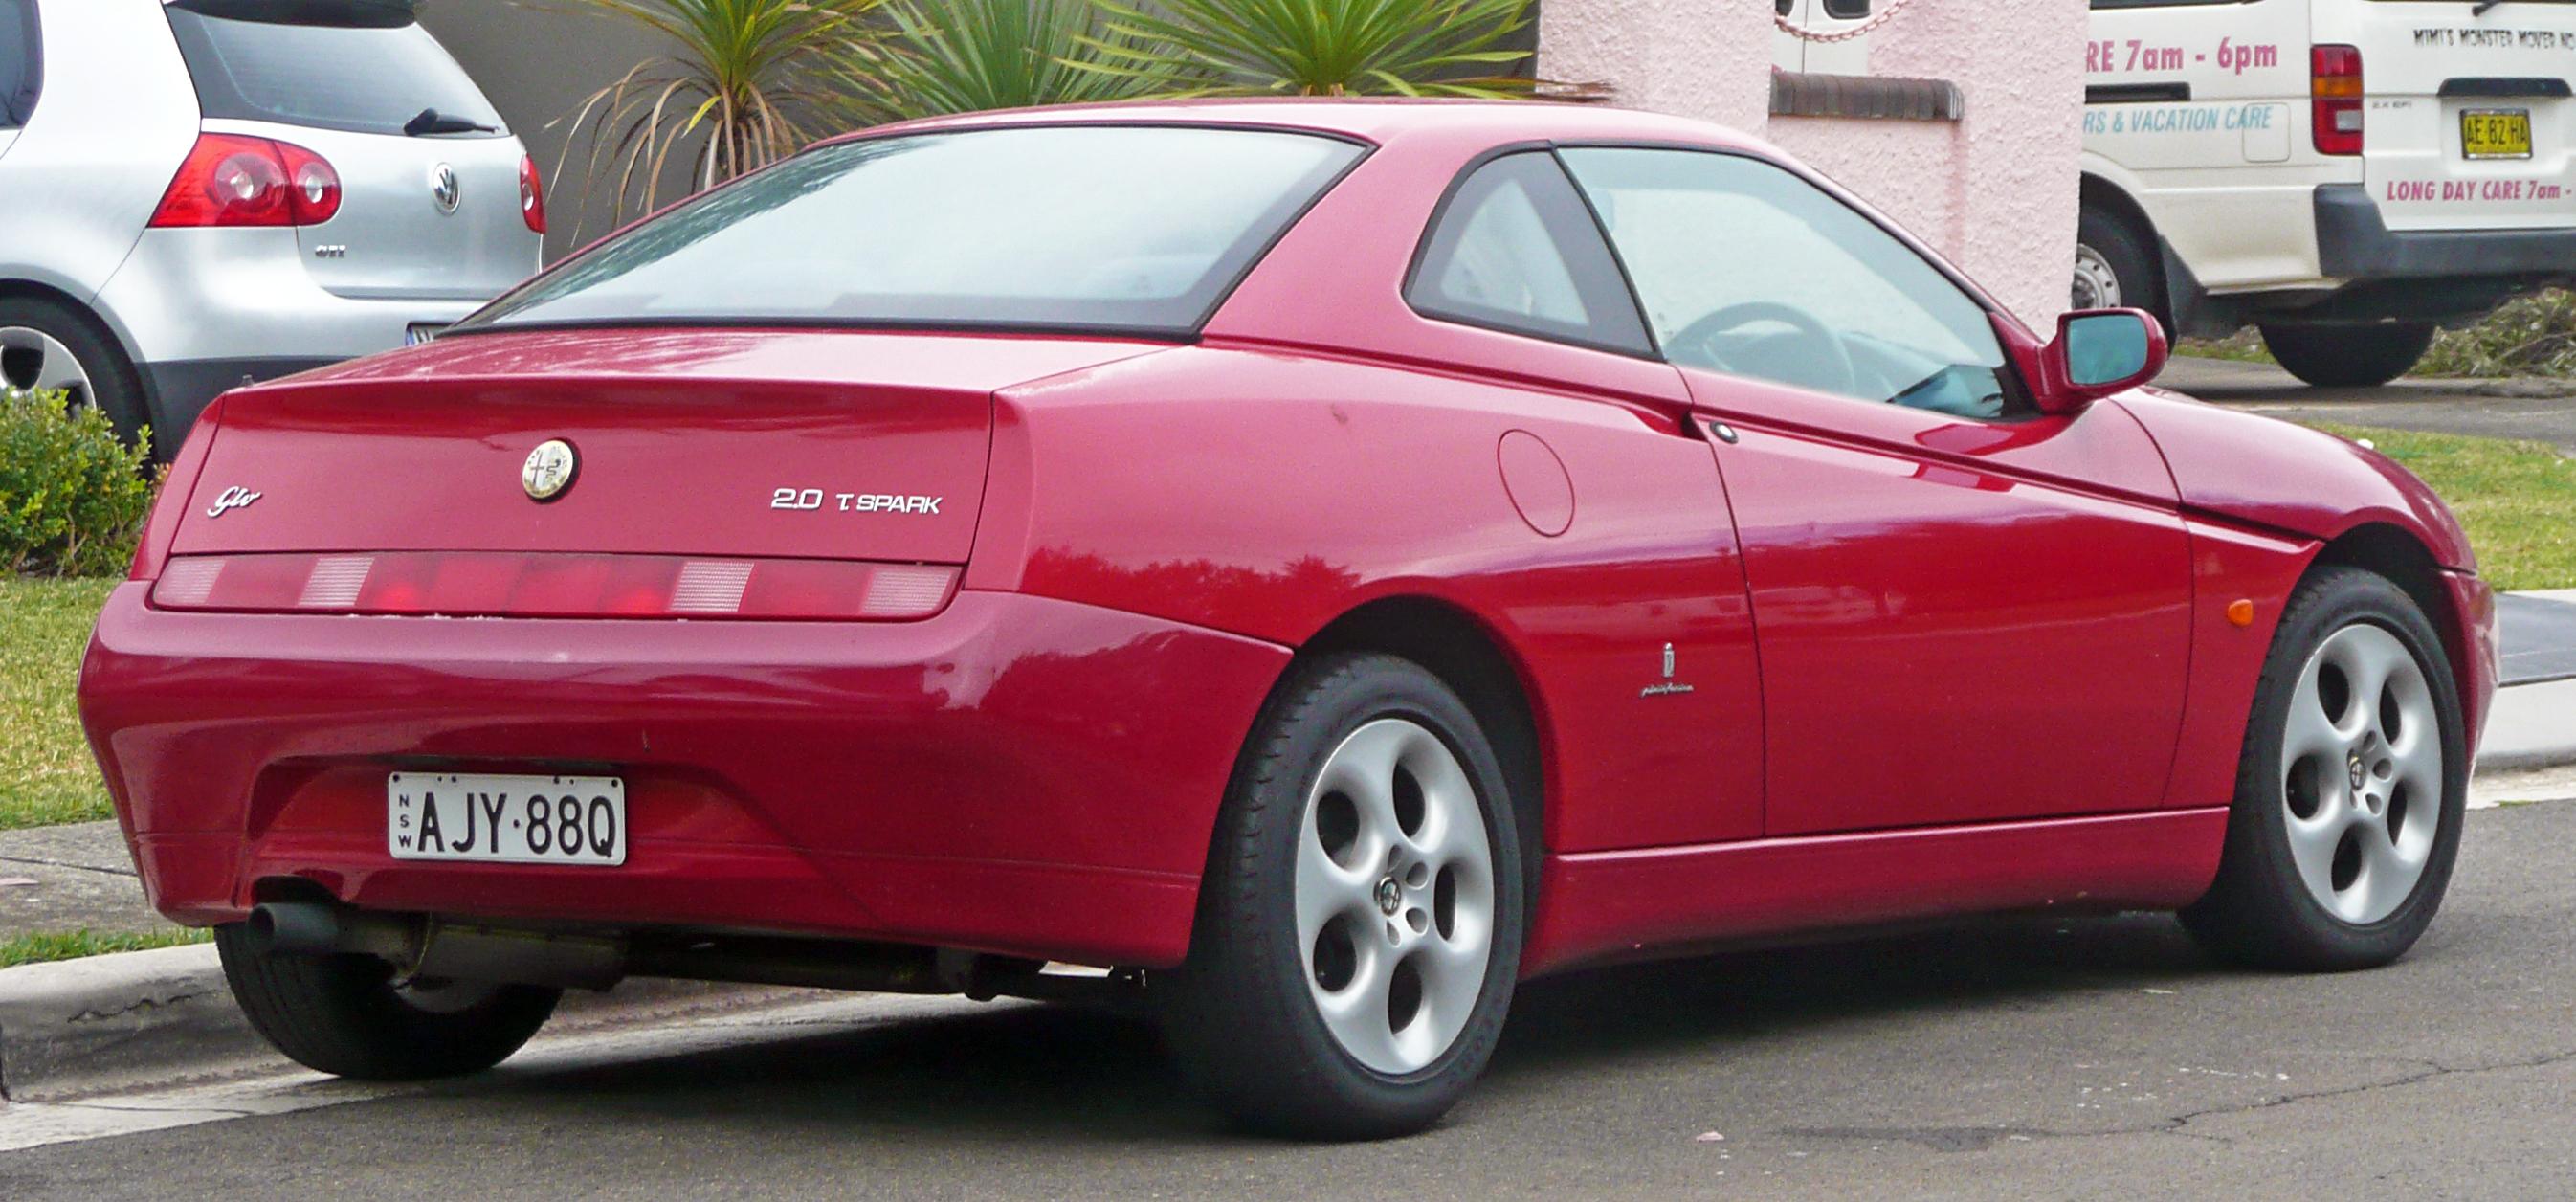 File:1998-2003 Alfa Romeo GTV Twin Spark coupe 03.jpg ...